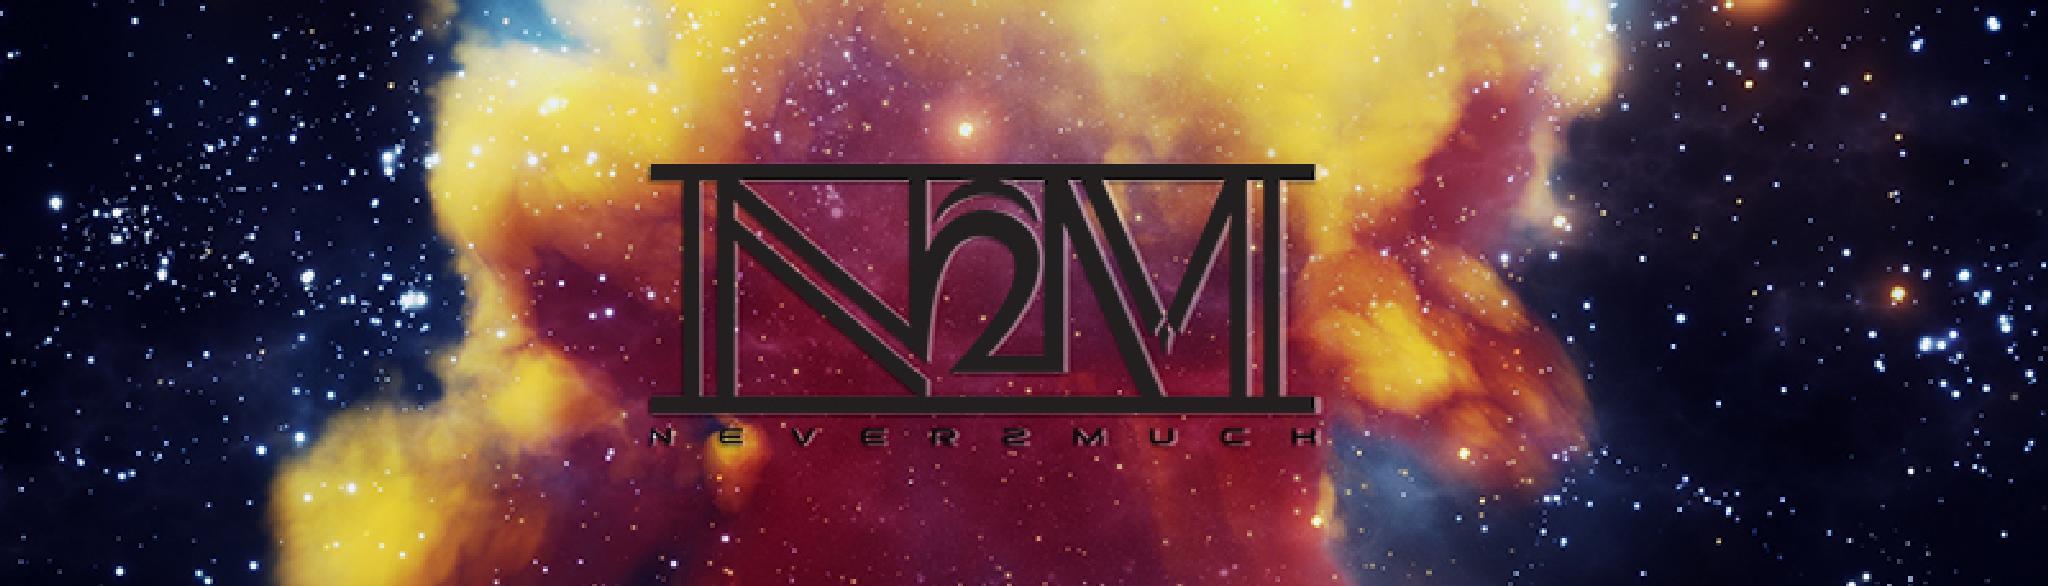 N2M  by Michael Vascellaro